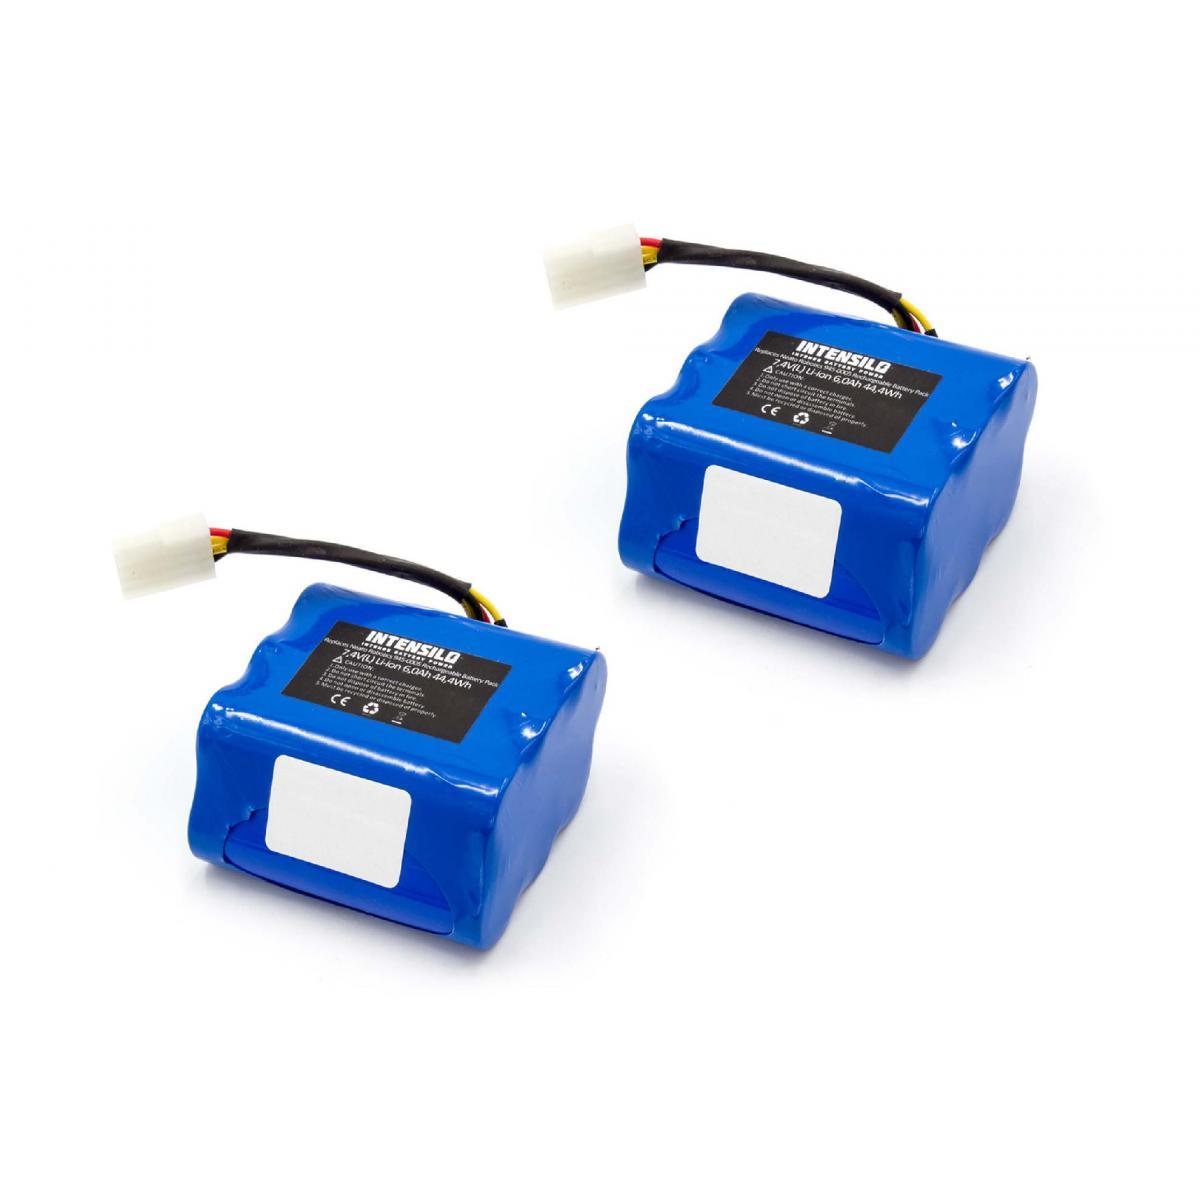 Vhbw INTENSILO 2x batterie compatible avec Neato 945-0080, All Floor, Signature 25, VX Pro aspirateur Home Cleaner (6000mAh,